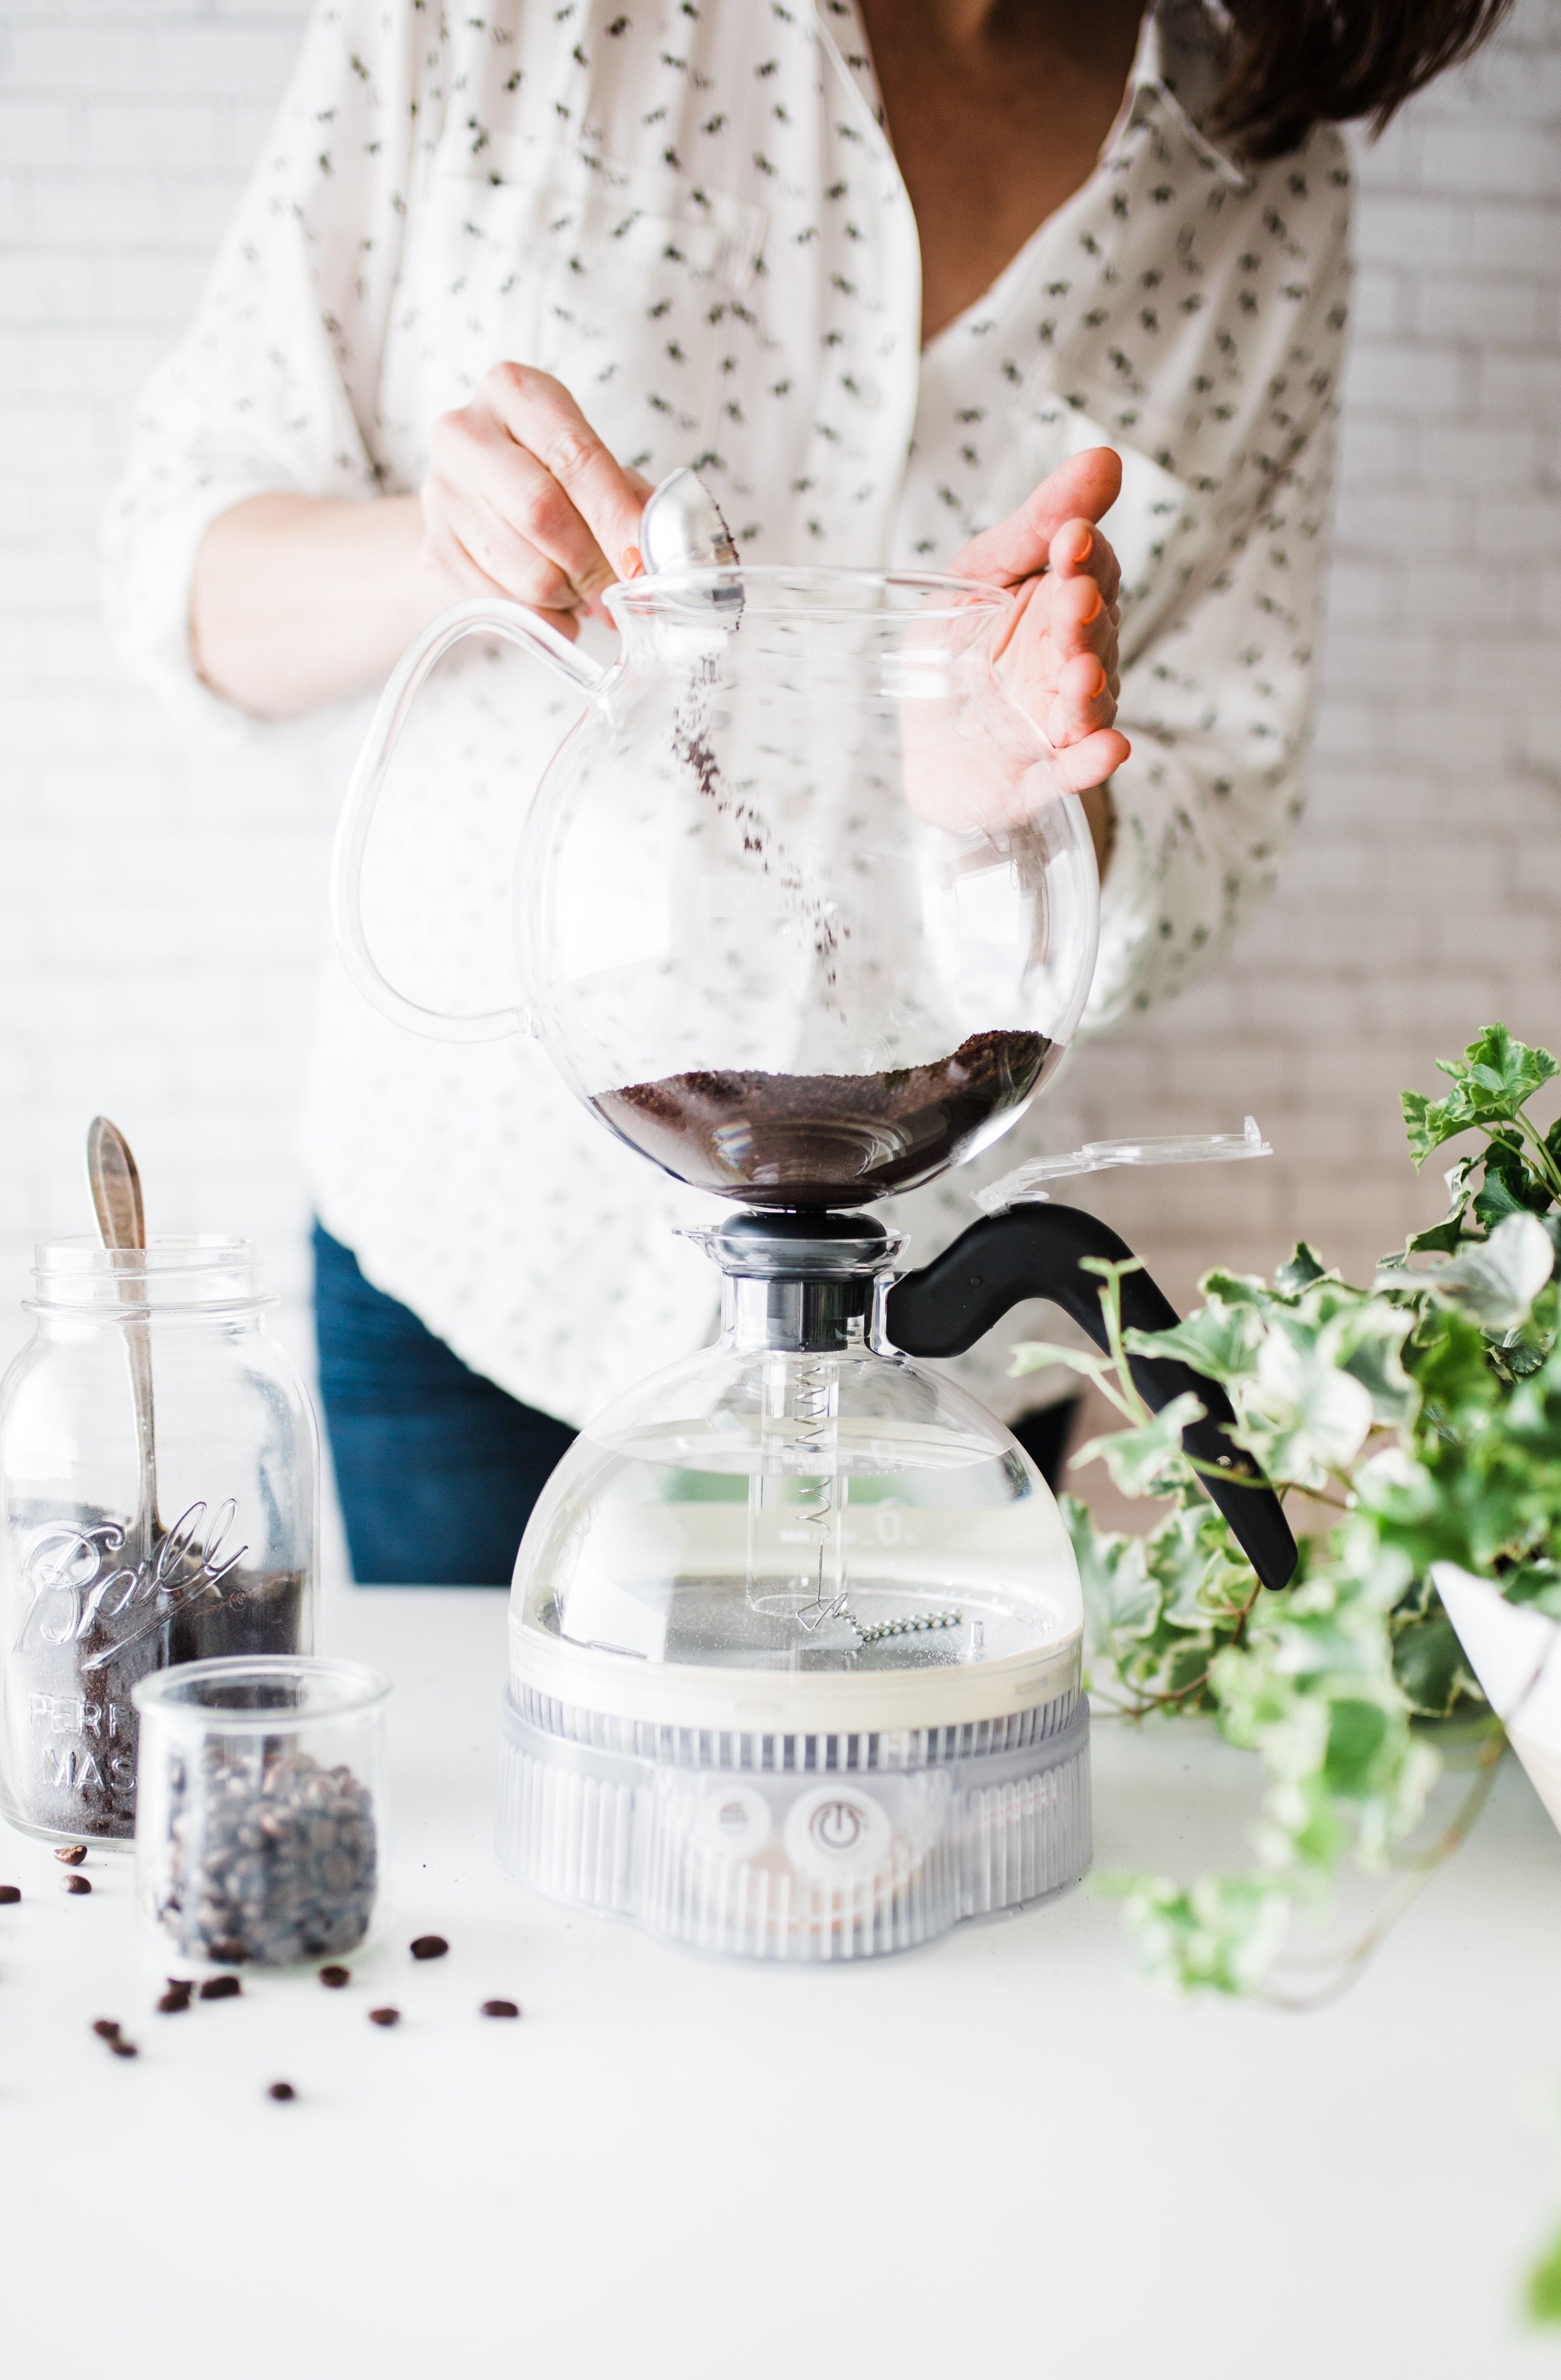 2018 02 Iha Coffee Vaccum 3 F Resize